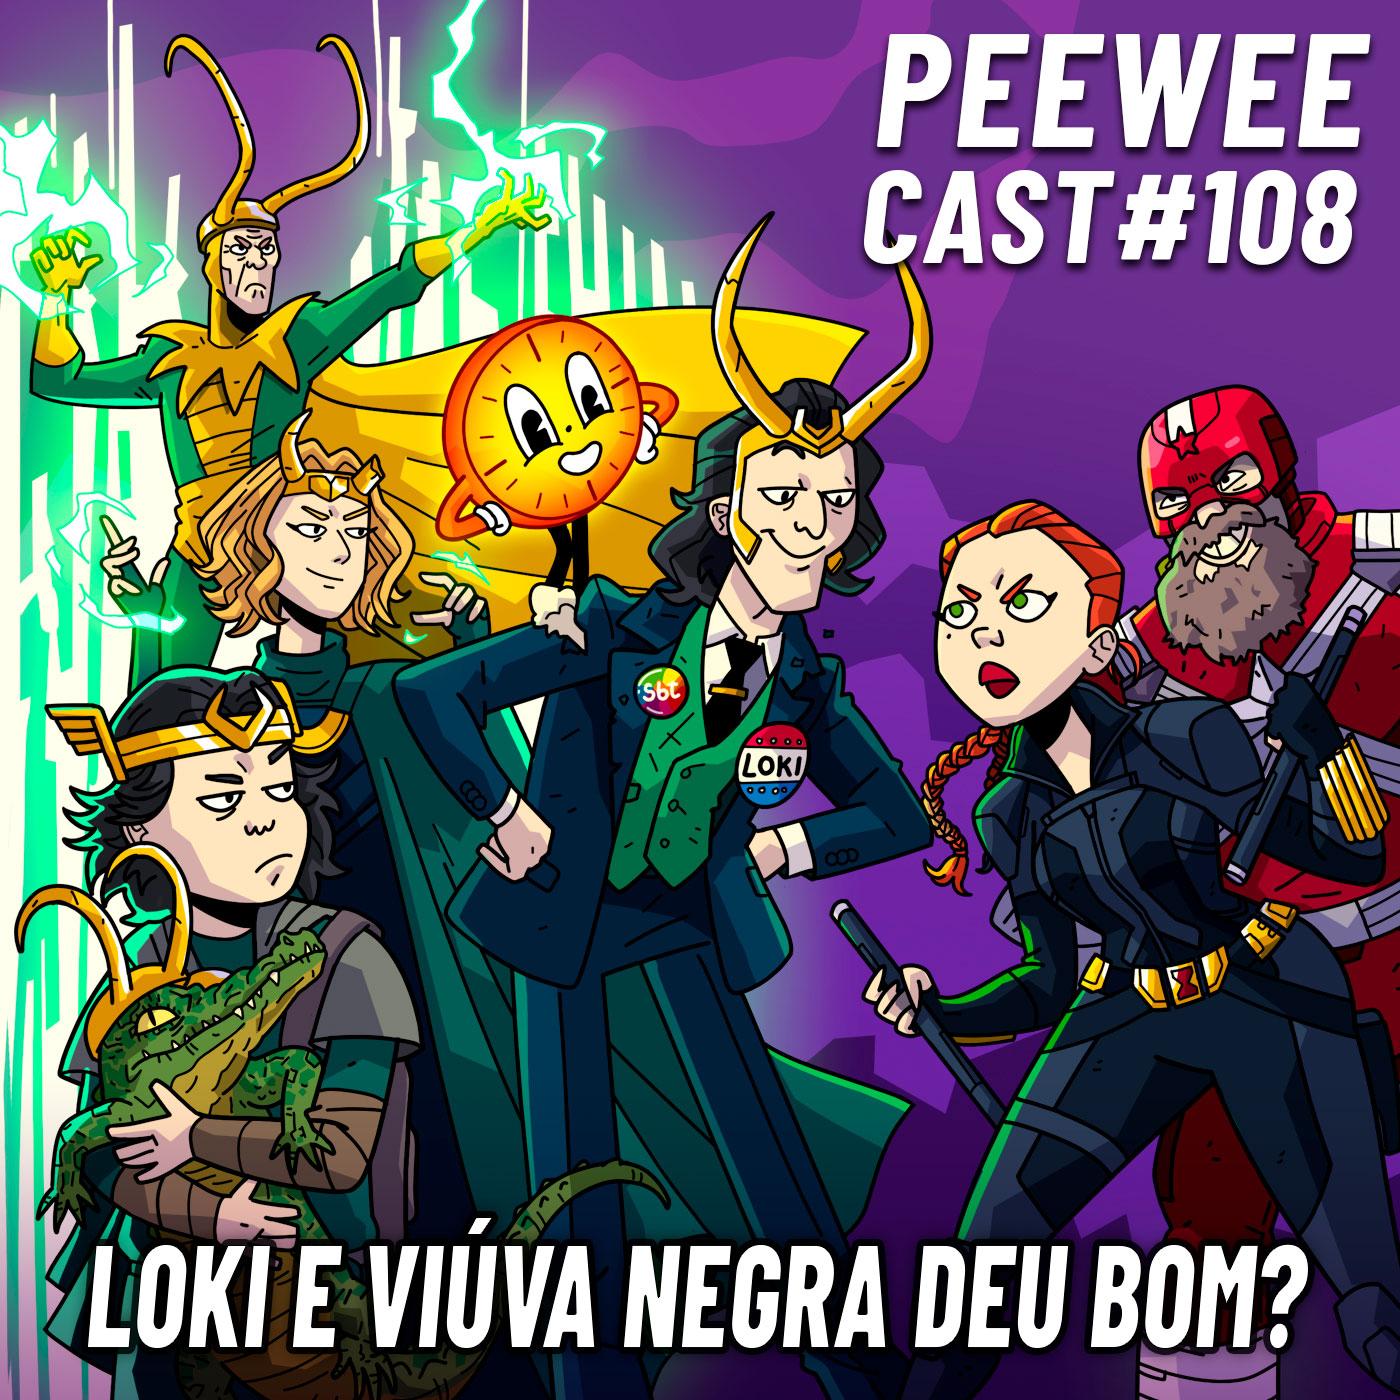 PWC108 – O que achamos de LOKI e VIÚVA NEGRA